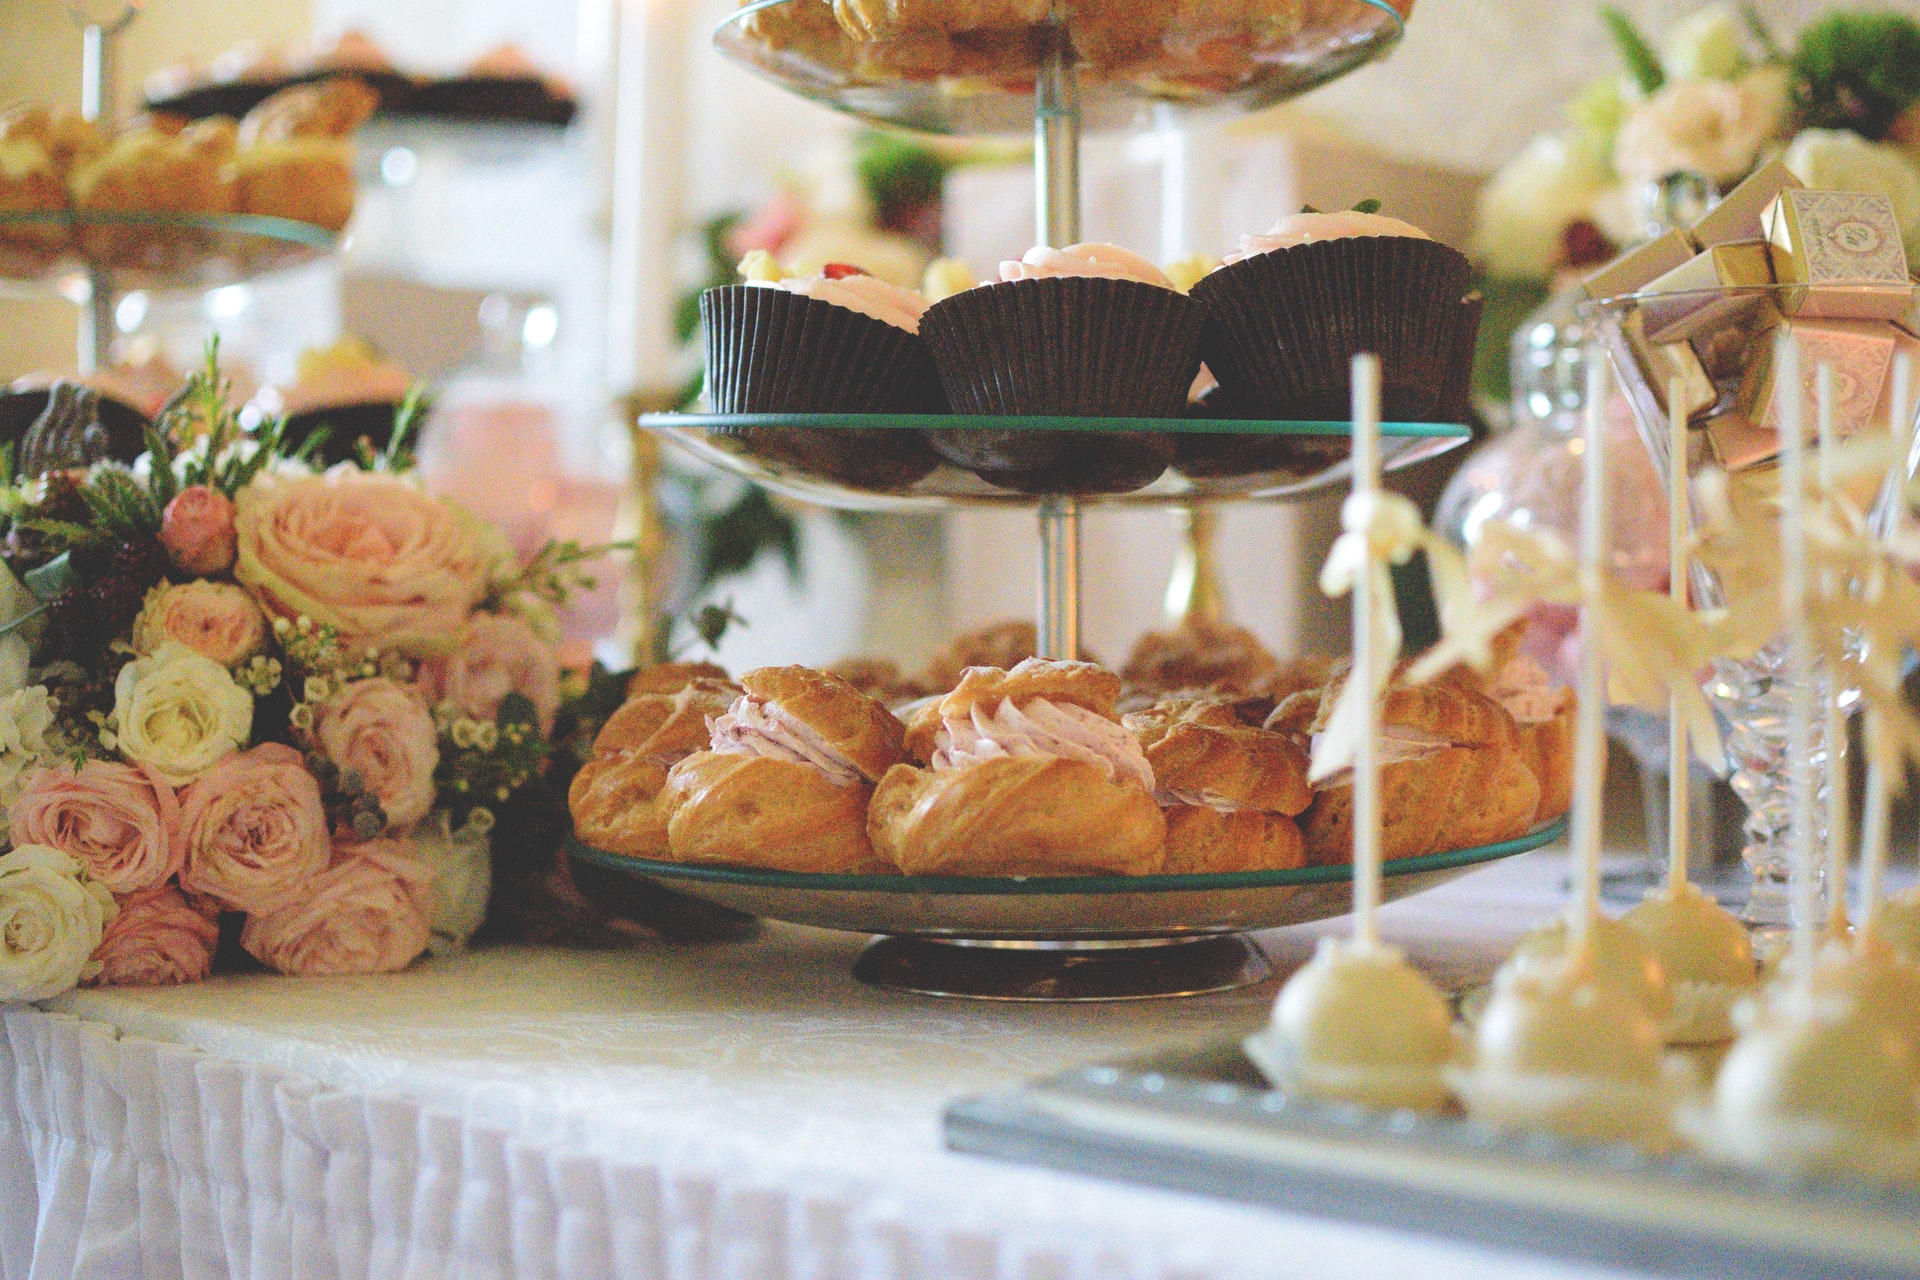 Mathieson's Memories: Baking, Working, Dancing